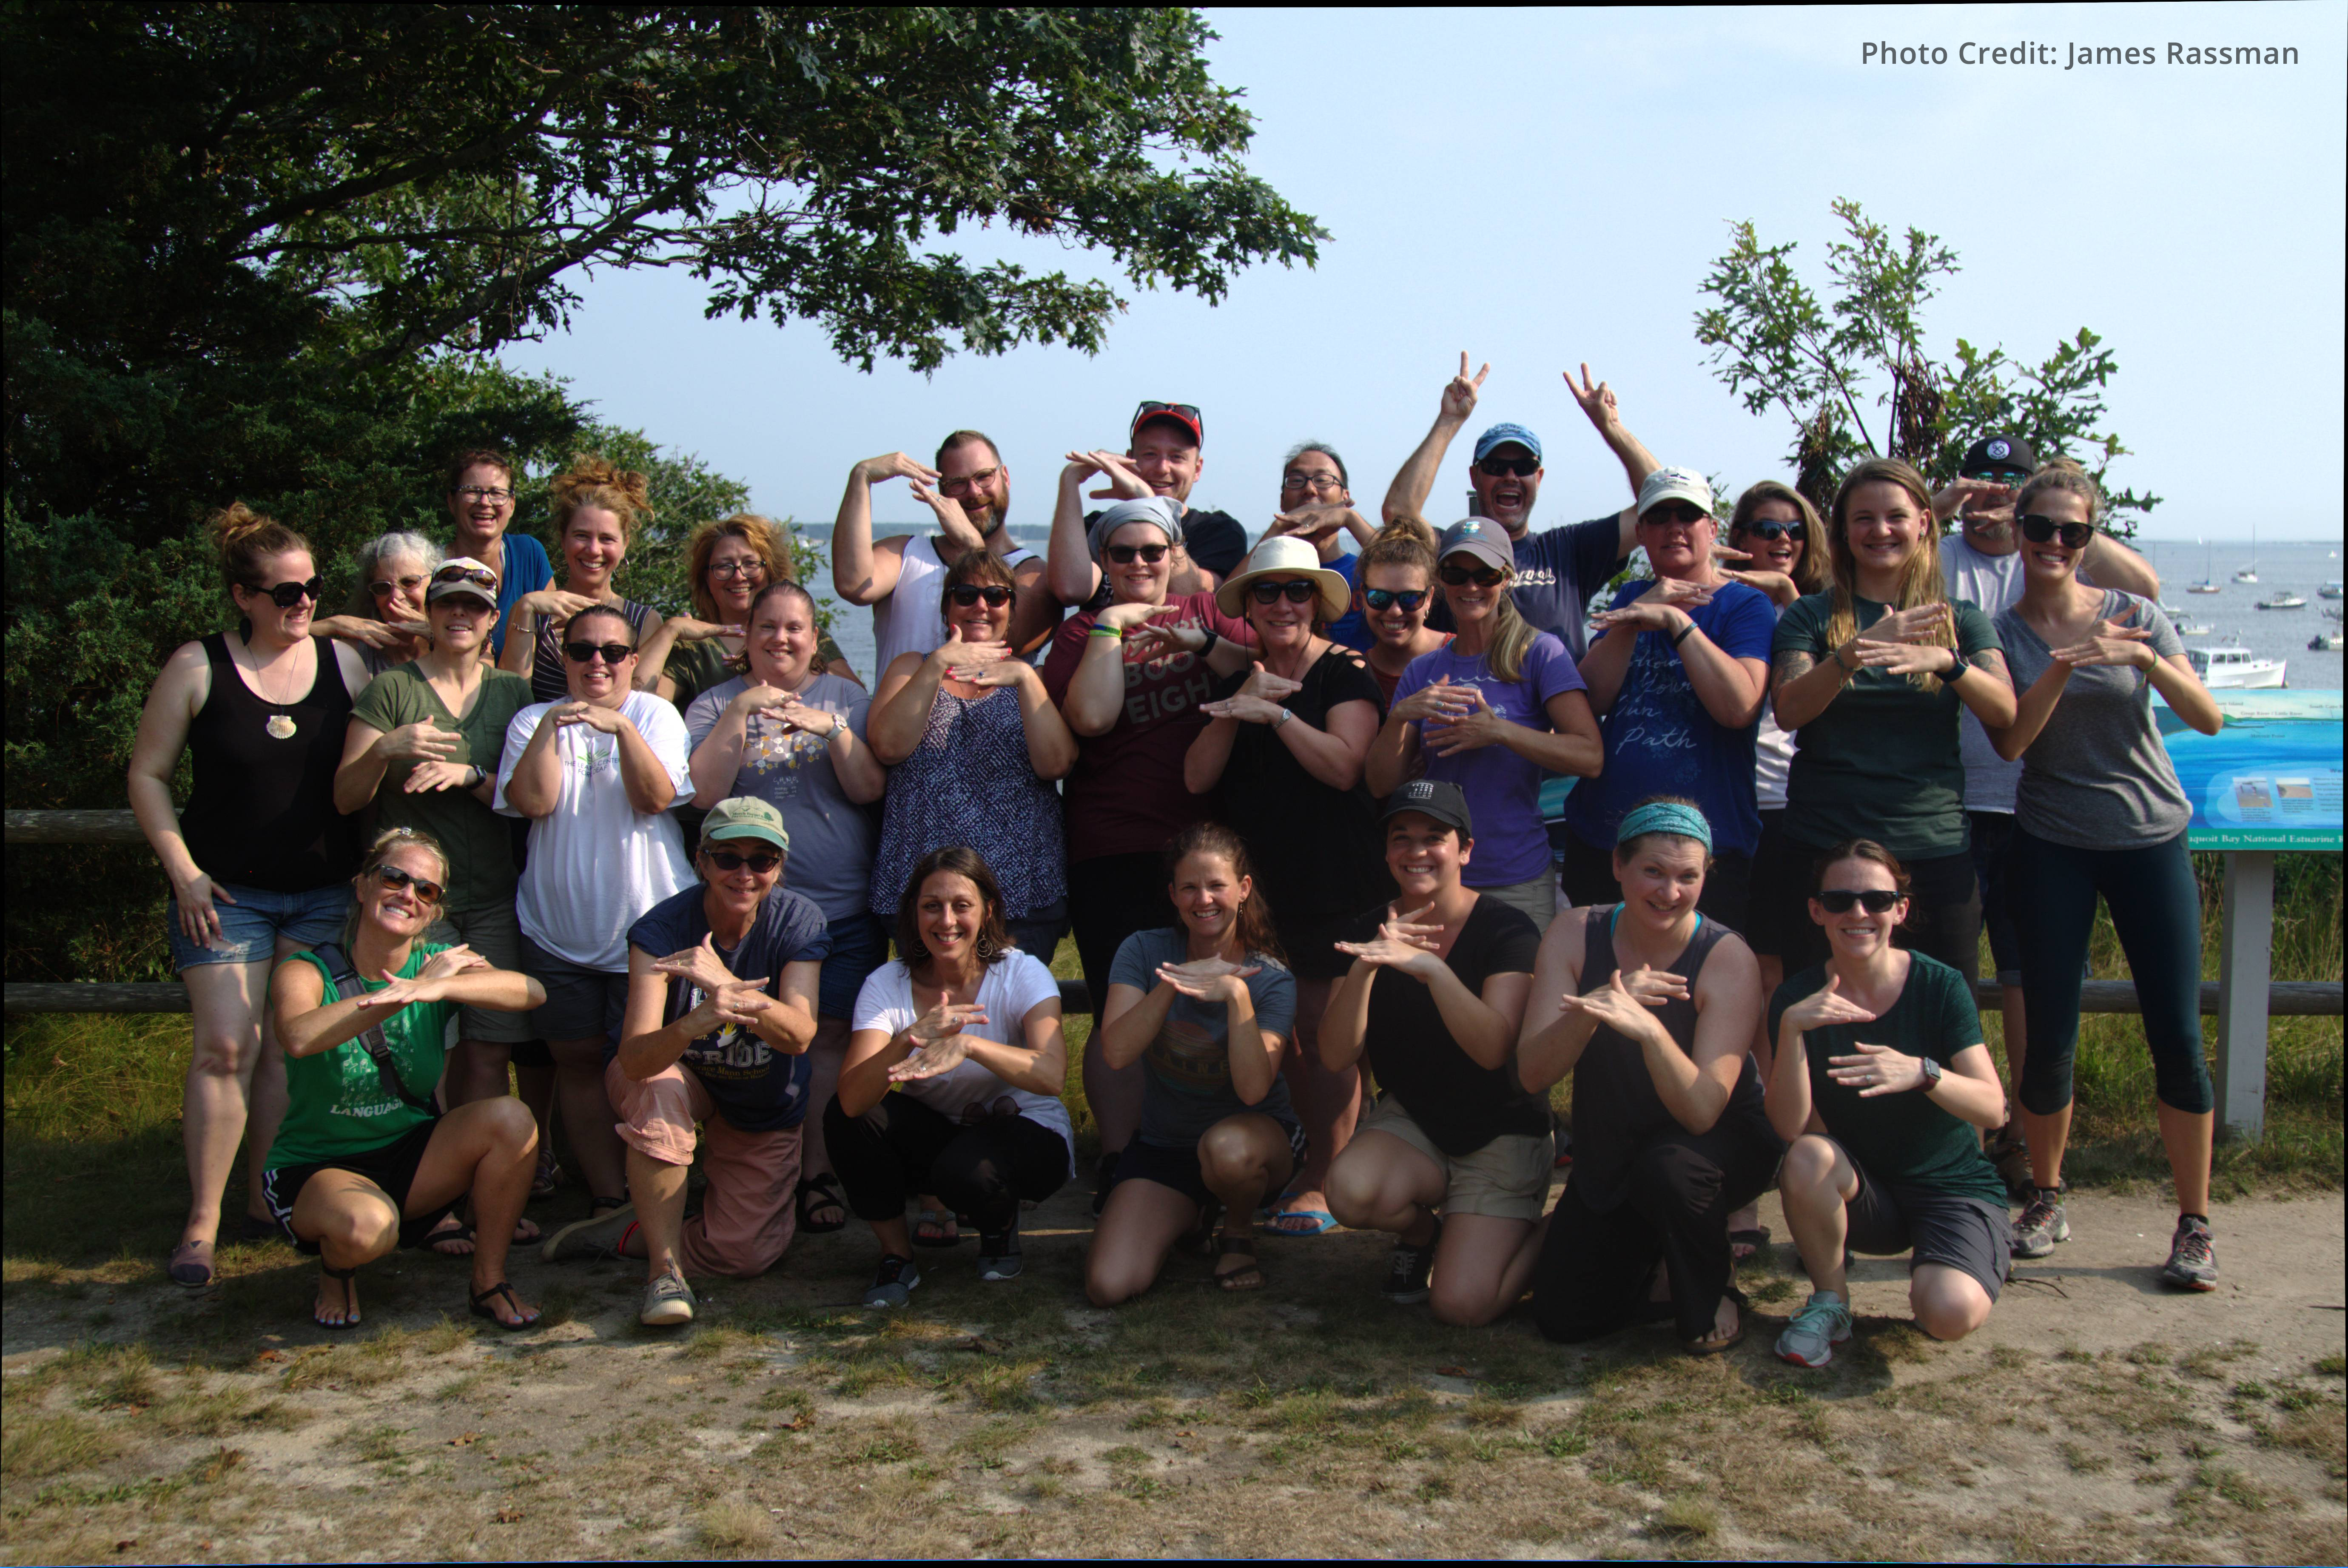 Estuary-in-American-Sign-Language.jpg